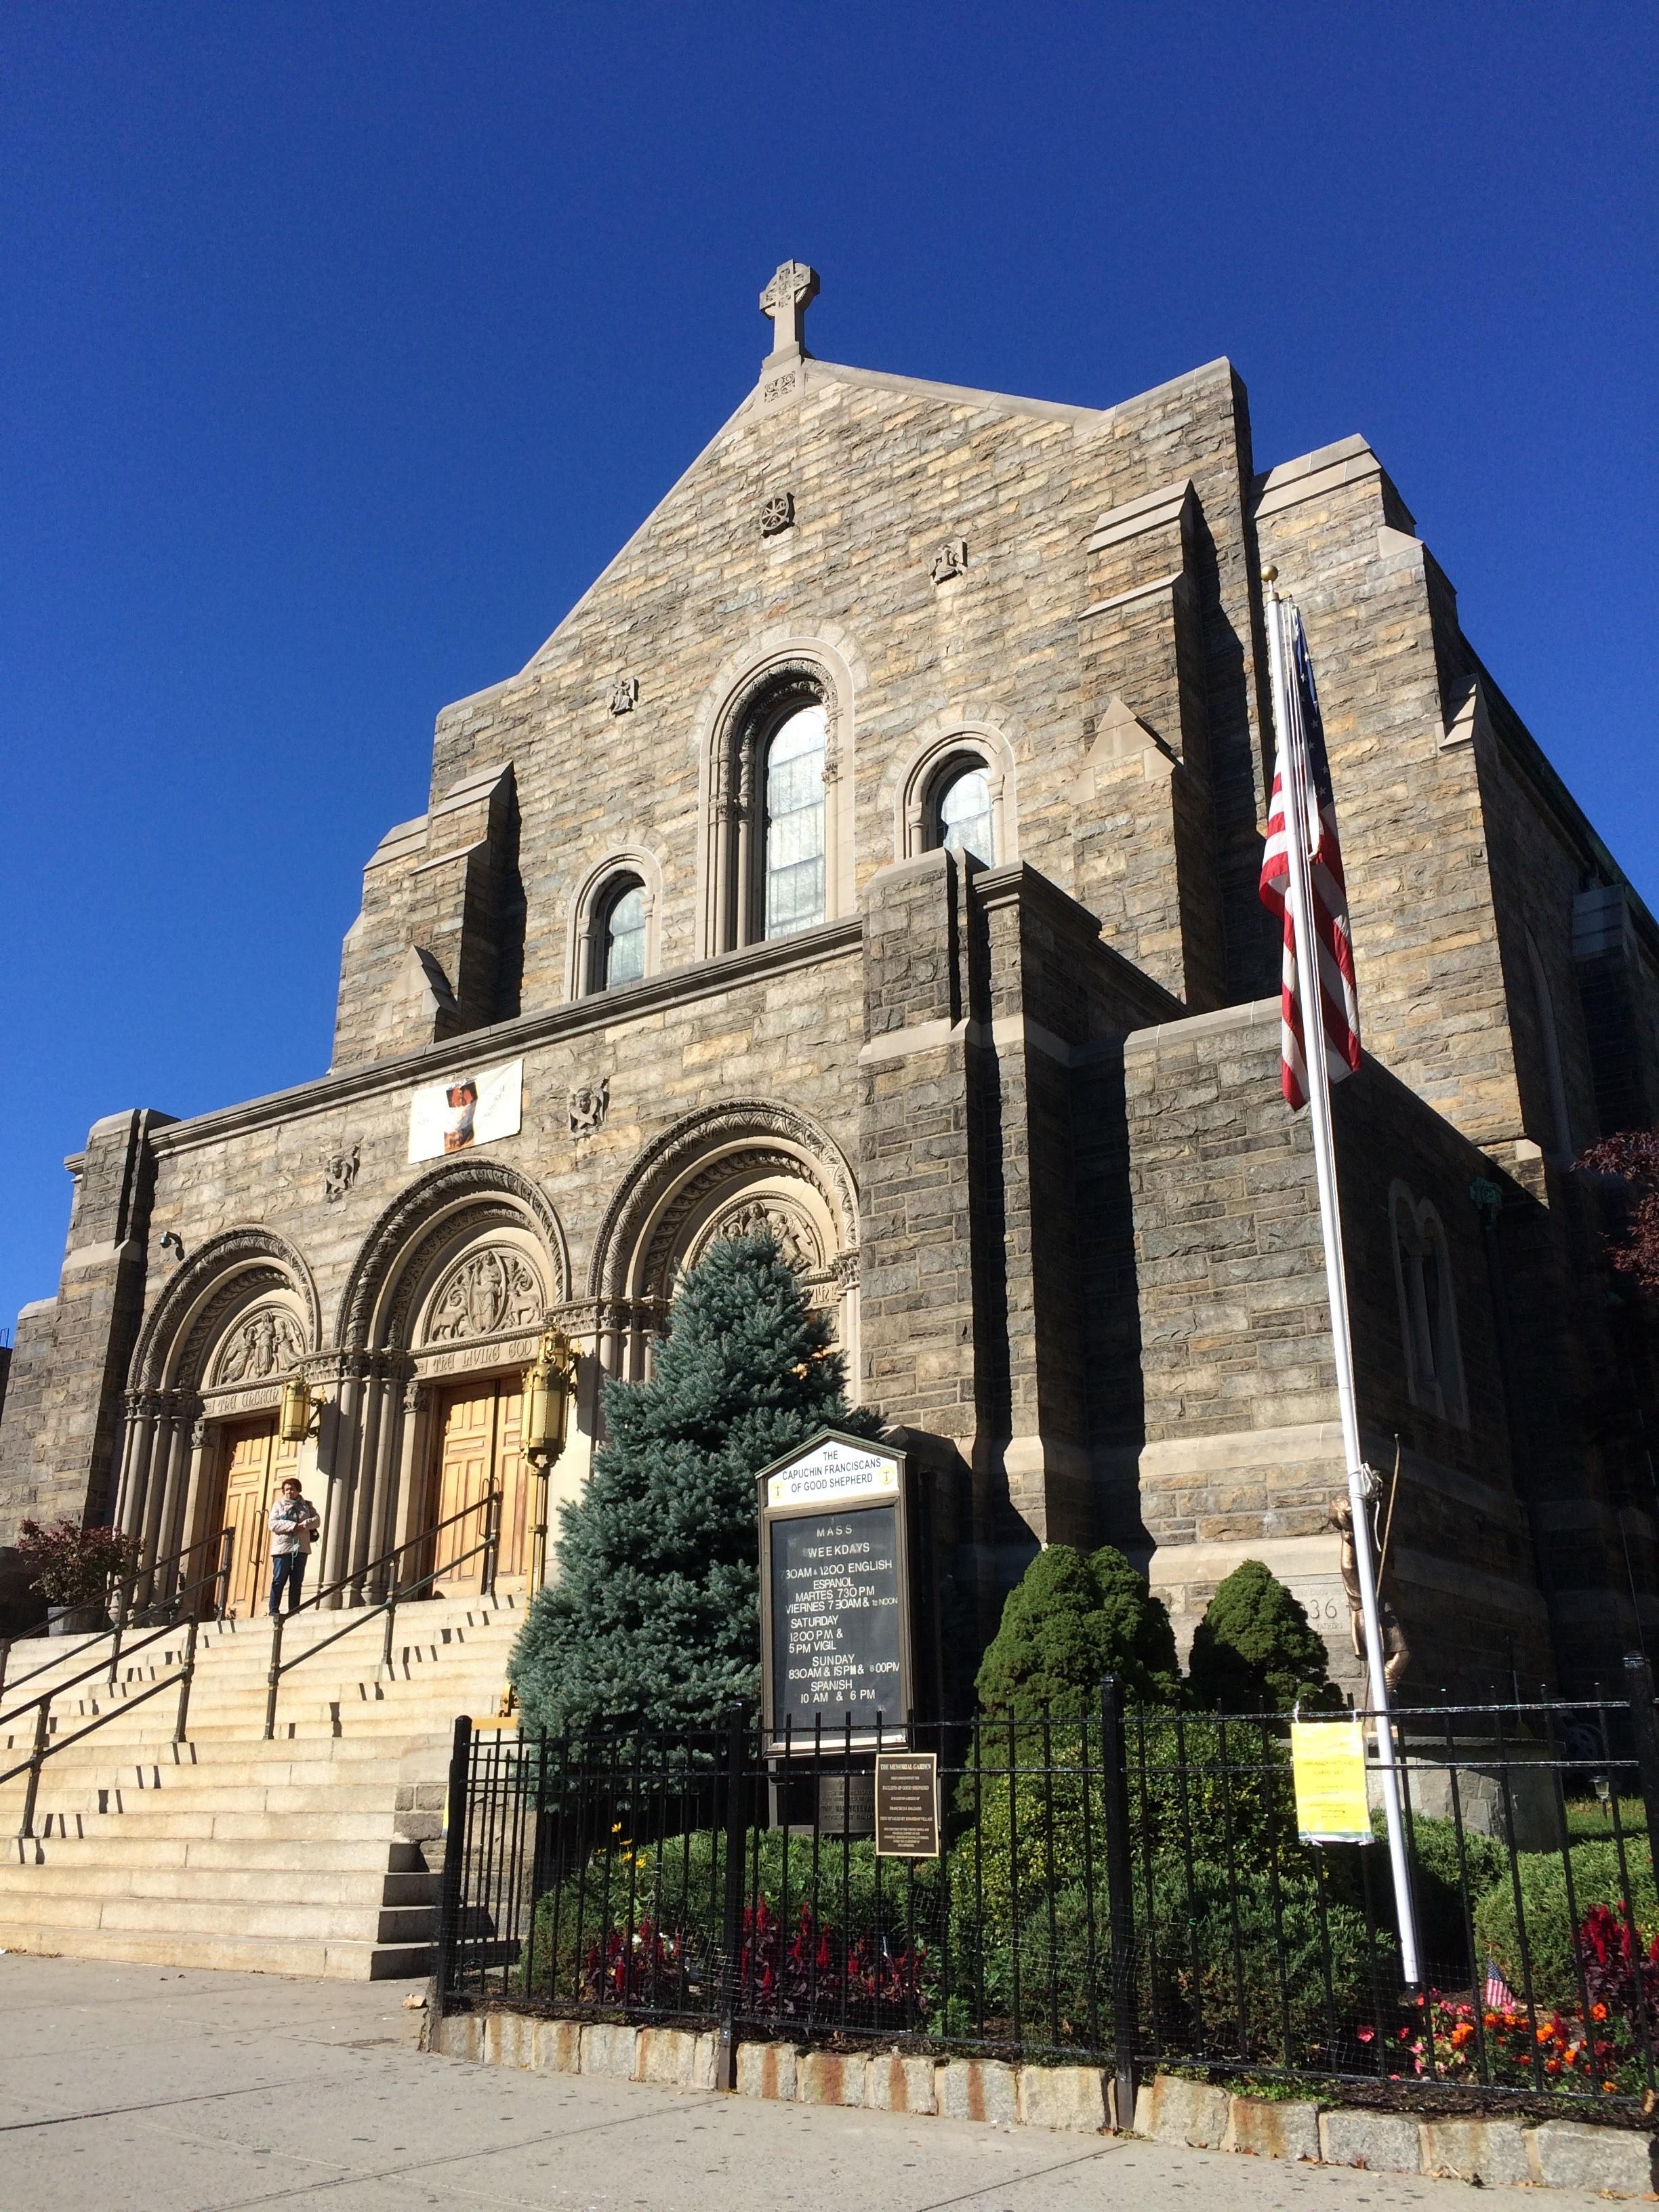 1. Church of the Good Shepherd